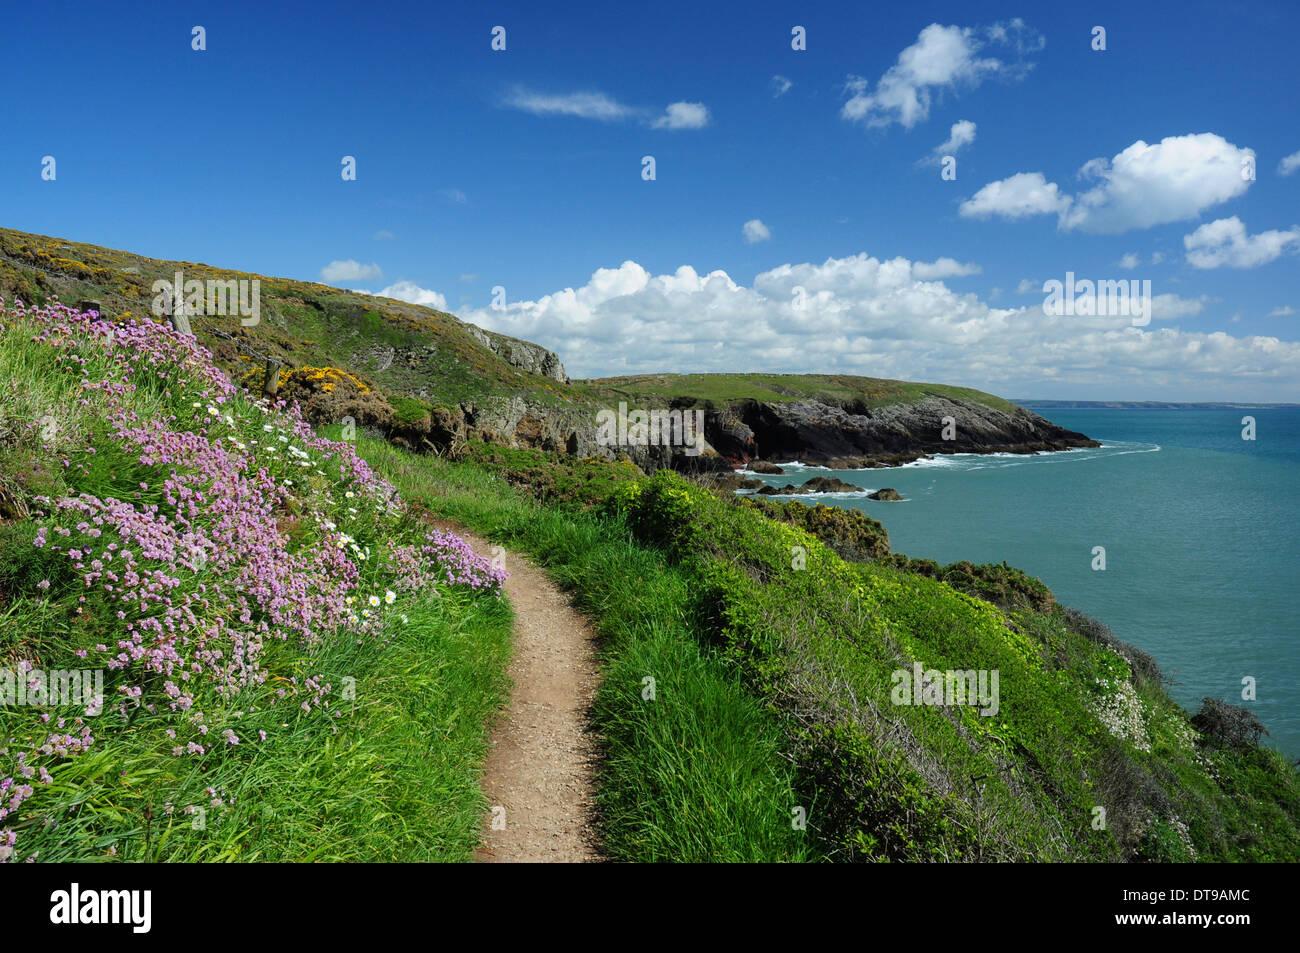 Wales Coast Path, Pembrokeshire, Wales, UK - Stock Image